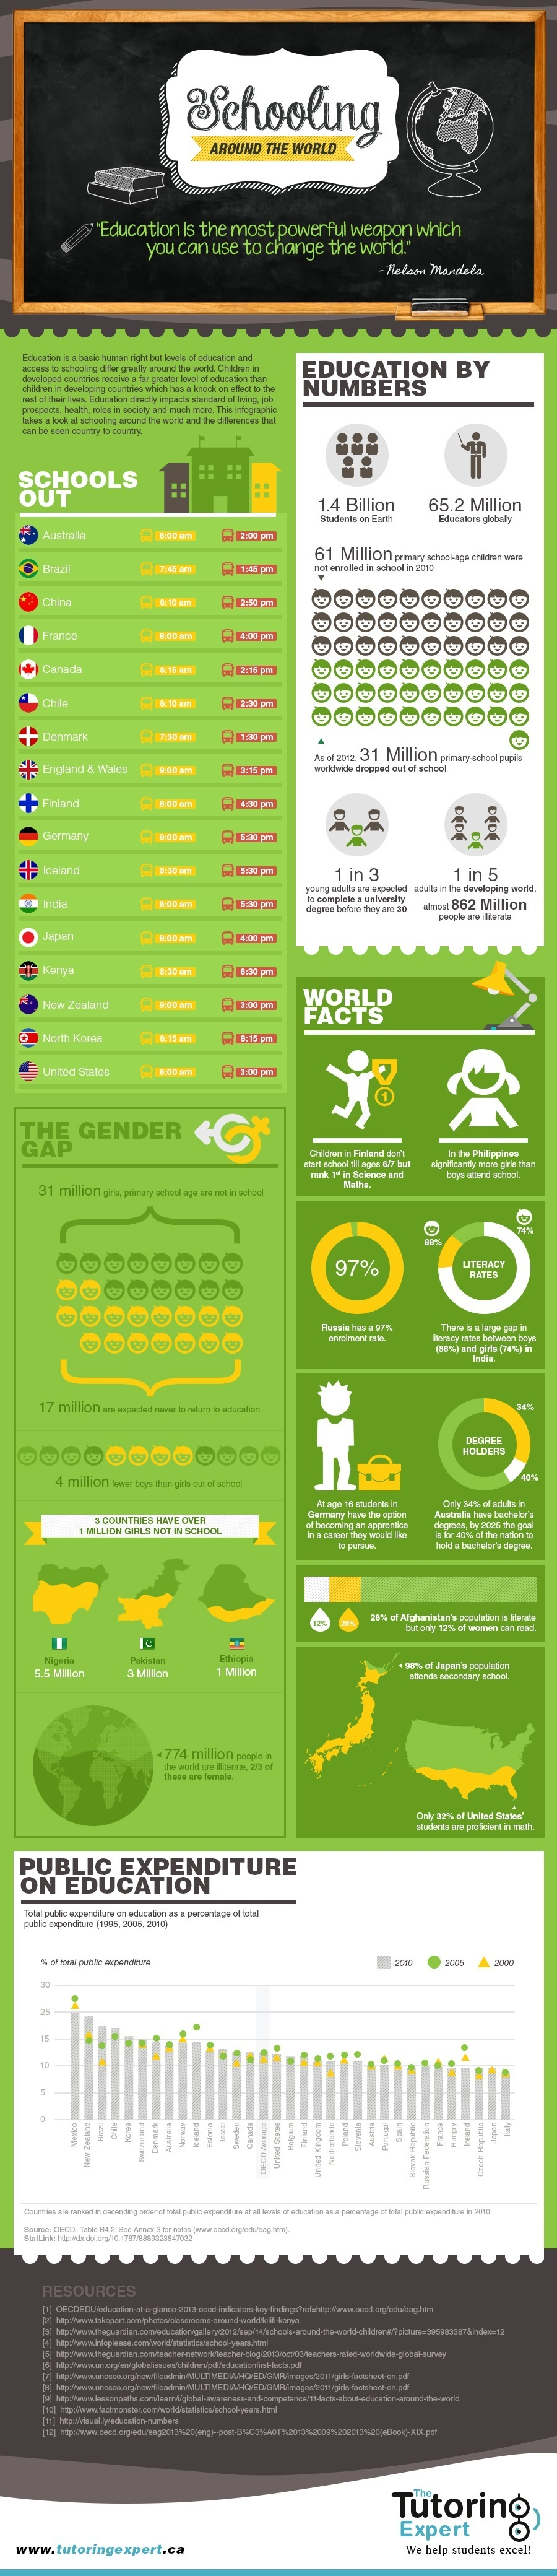 Schooling Around the World Infographic